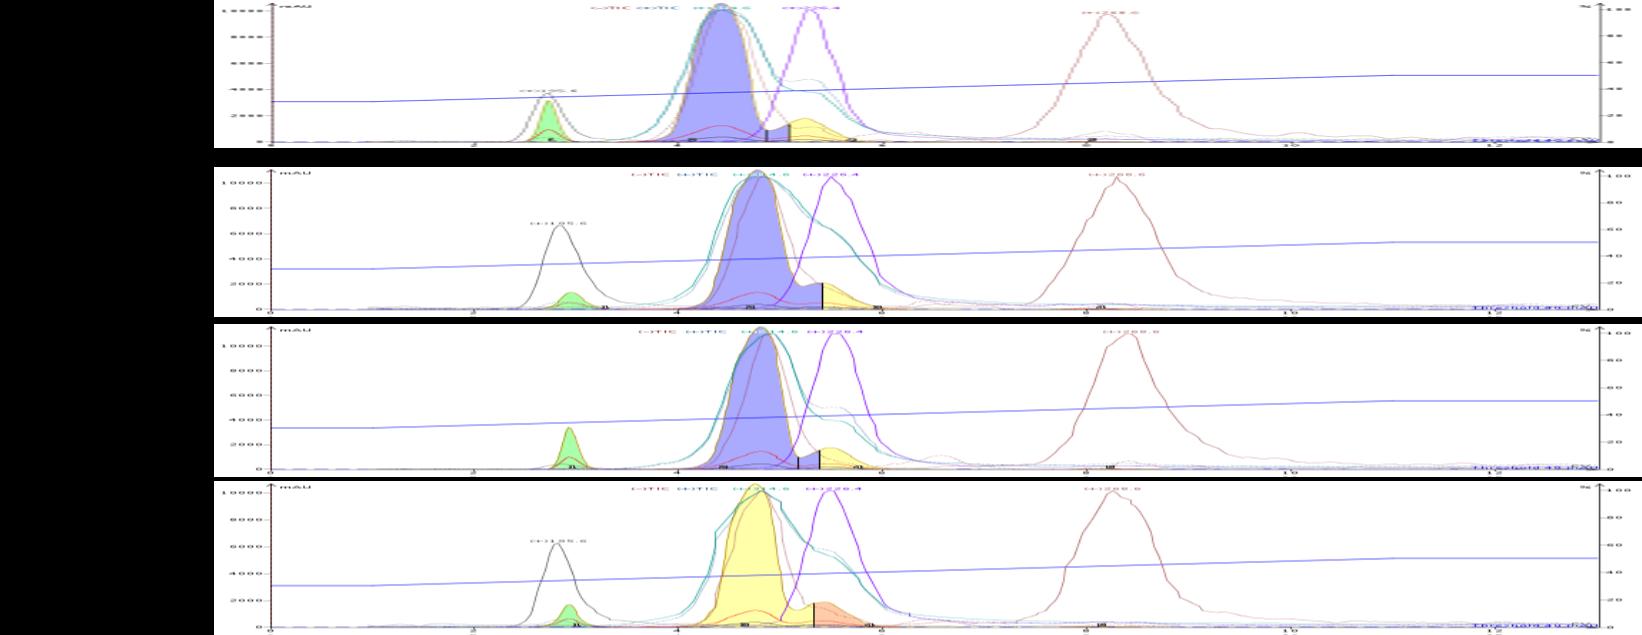 3-comp RxN inert media comparison